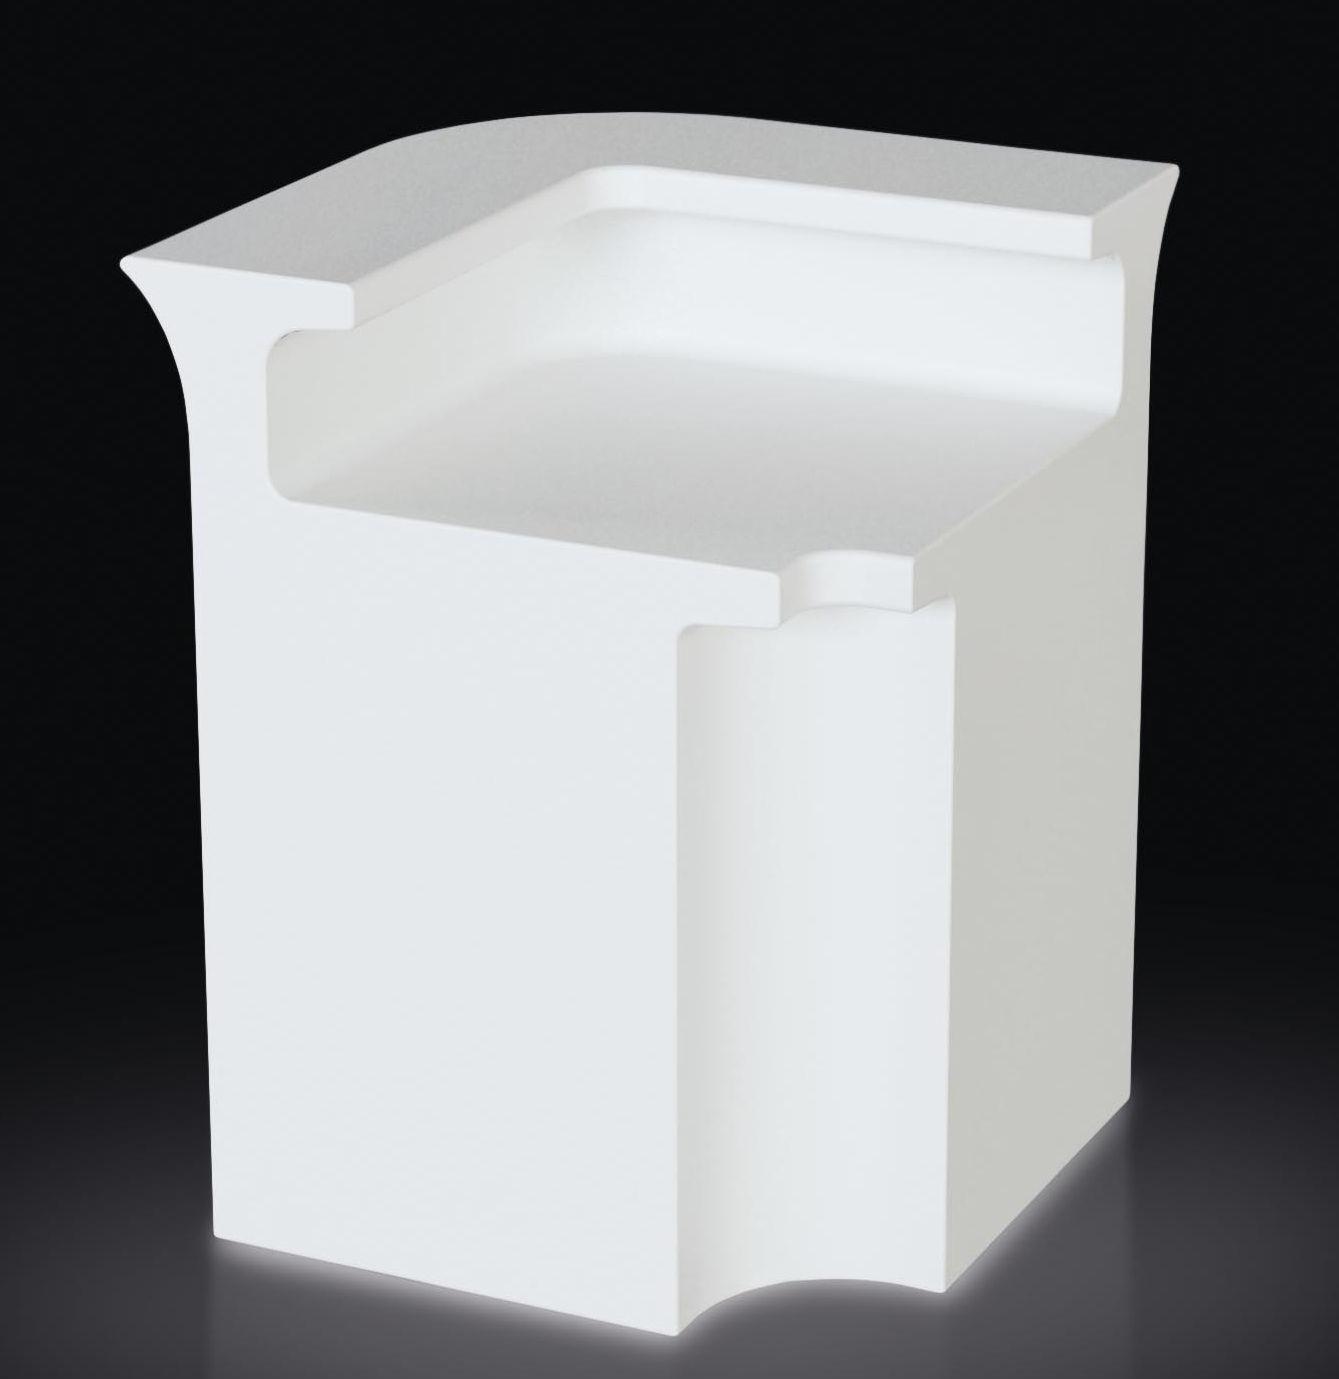 Möbel - Leuchtmöbel - Break Line beleuchtete Bar / Eck-Element - Slide - Weiß - polyéthène recyclable